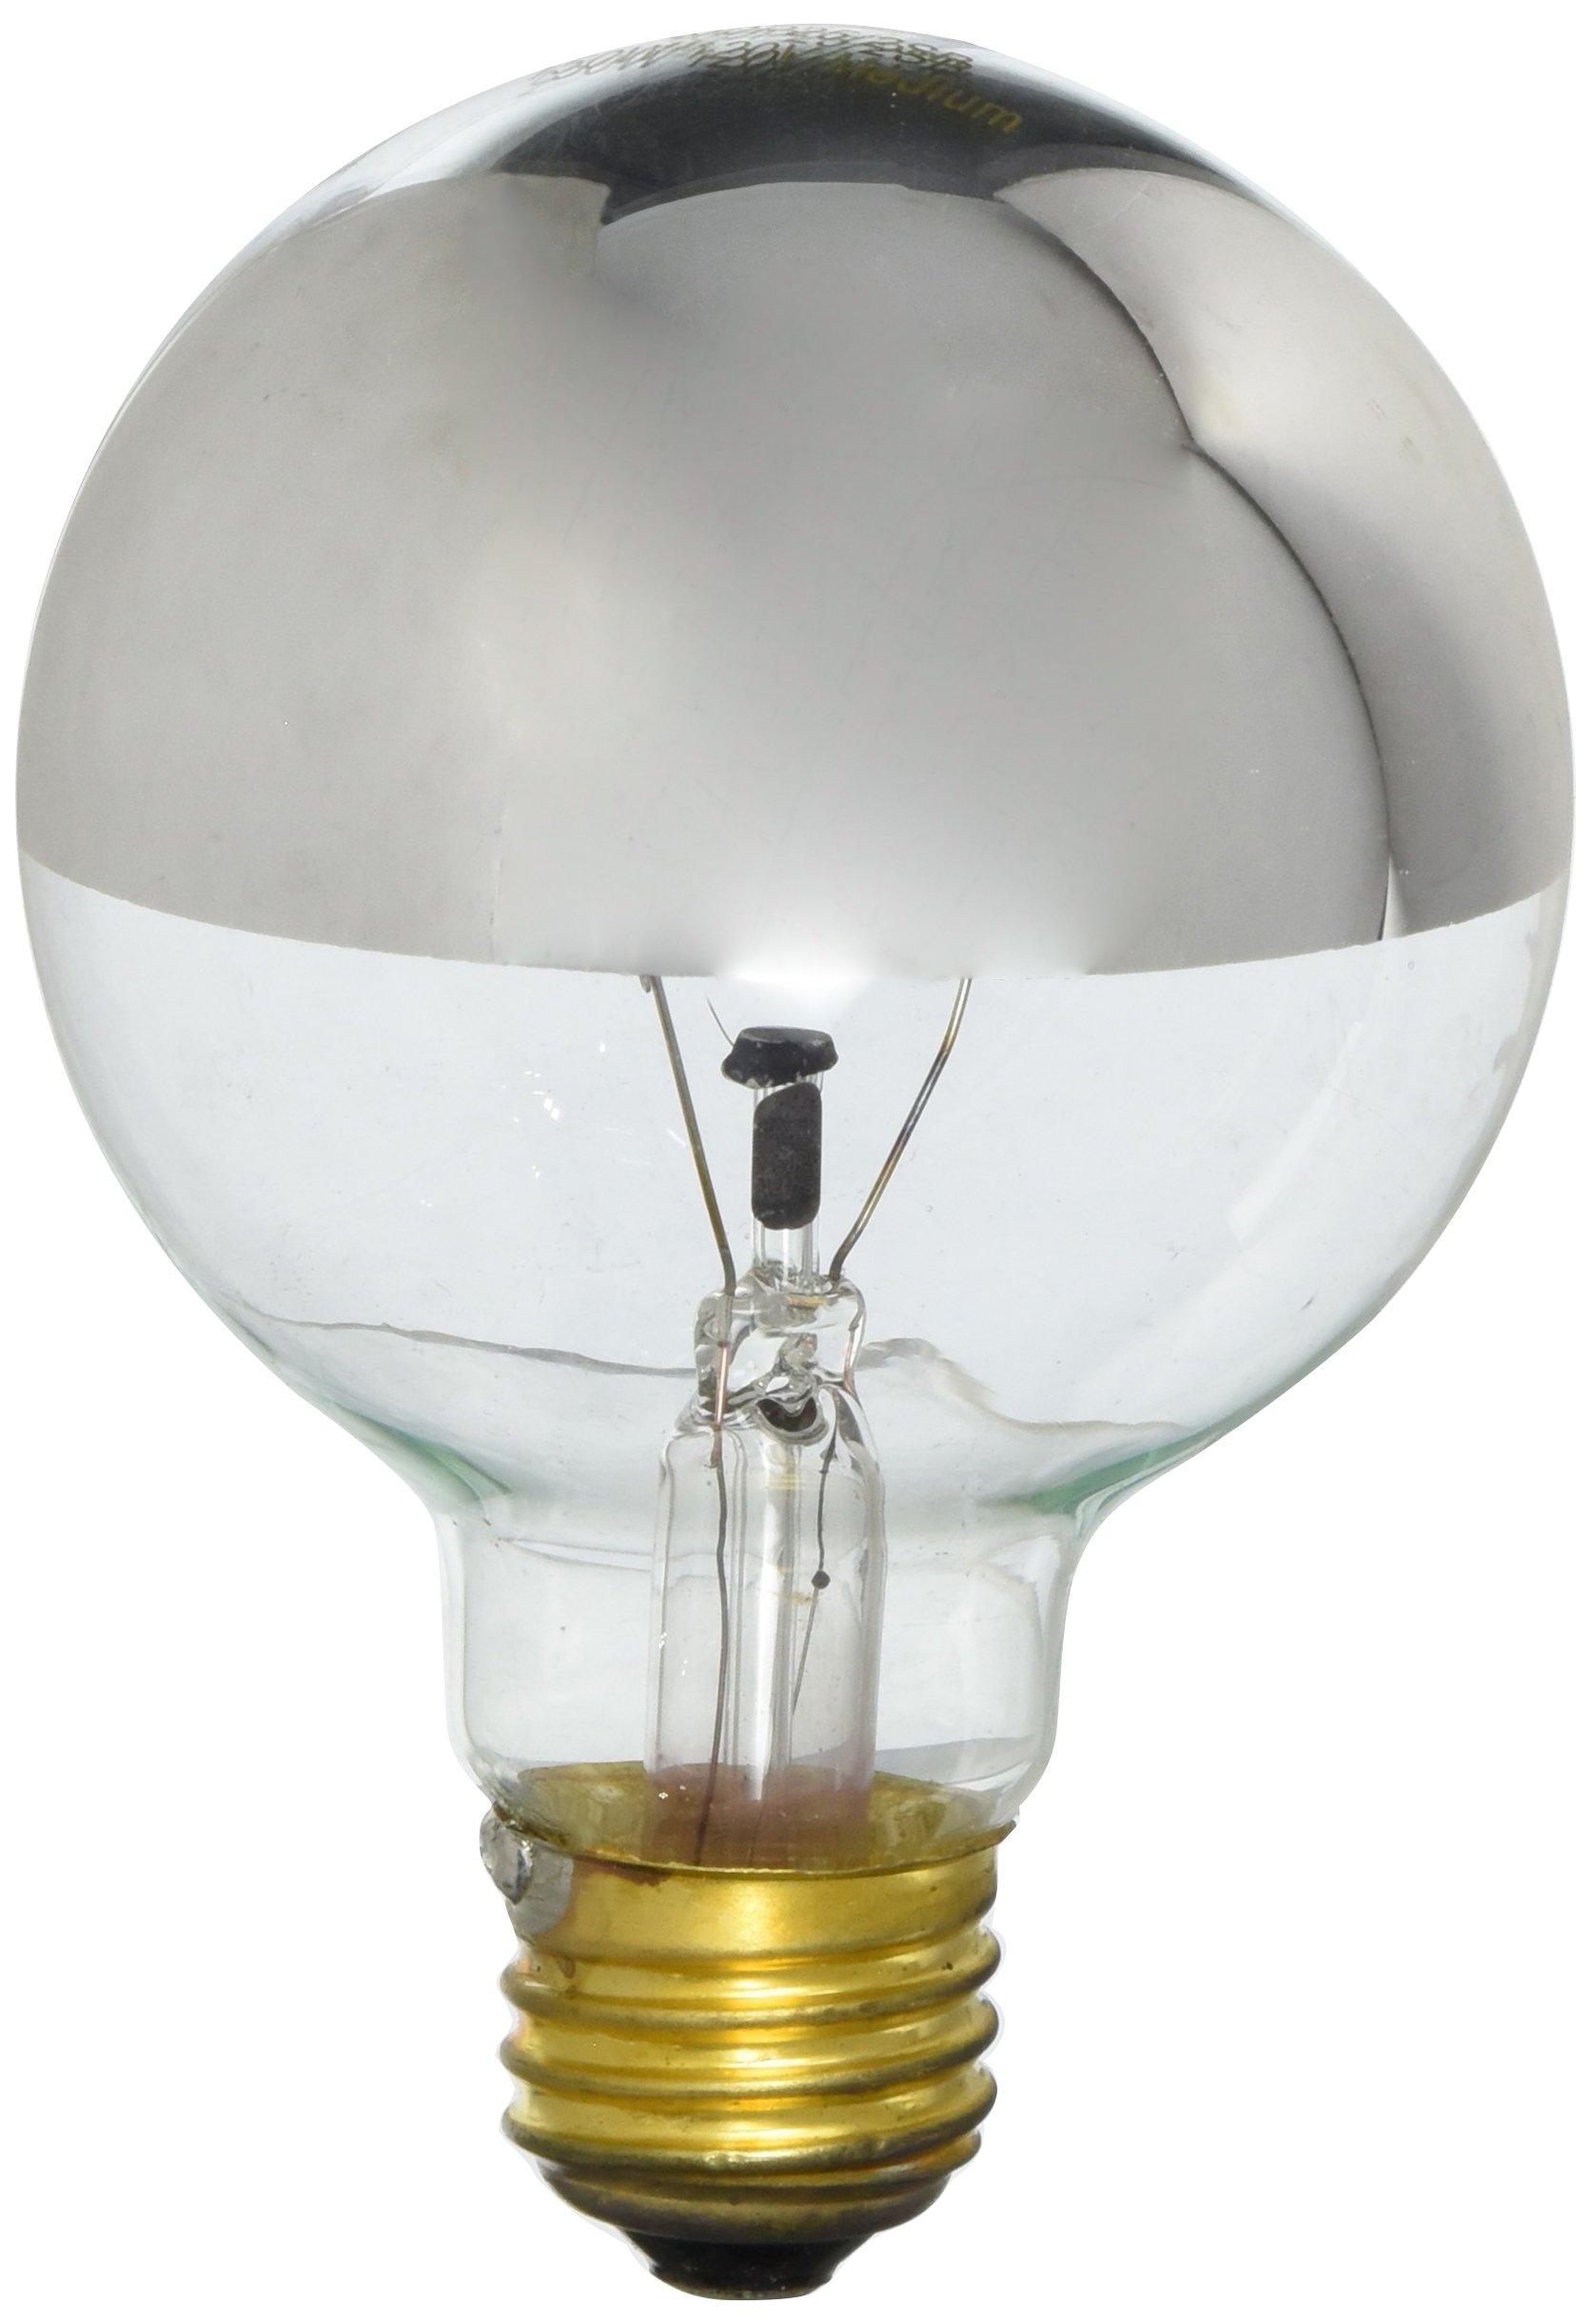 Ushio BC8971 8000071 - SM-150P25/2SB Healthcare Medical Scientific Light Bulb